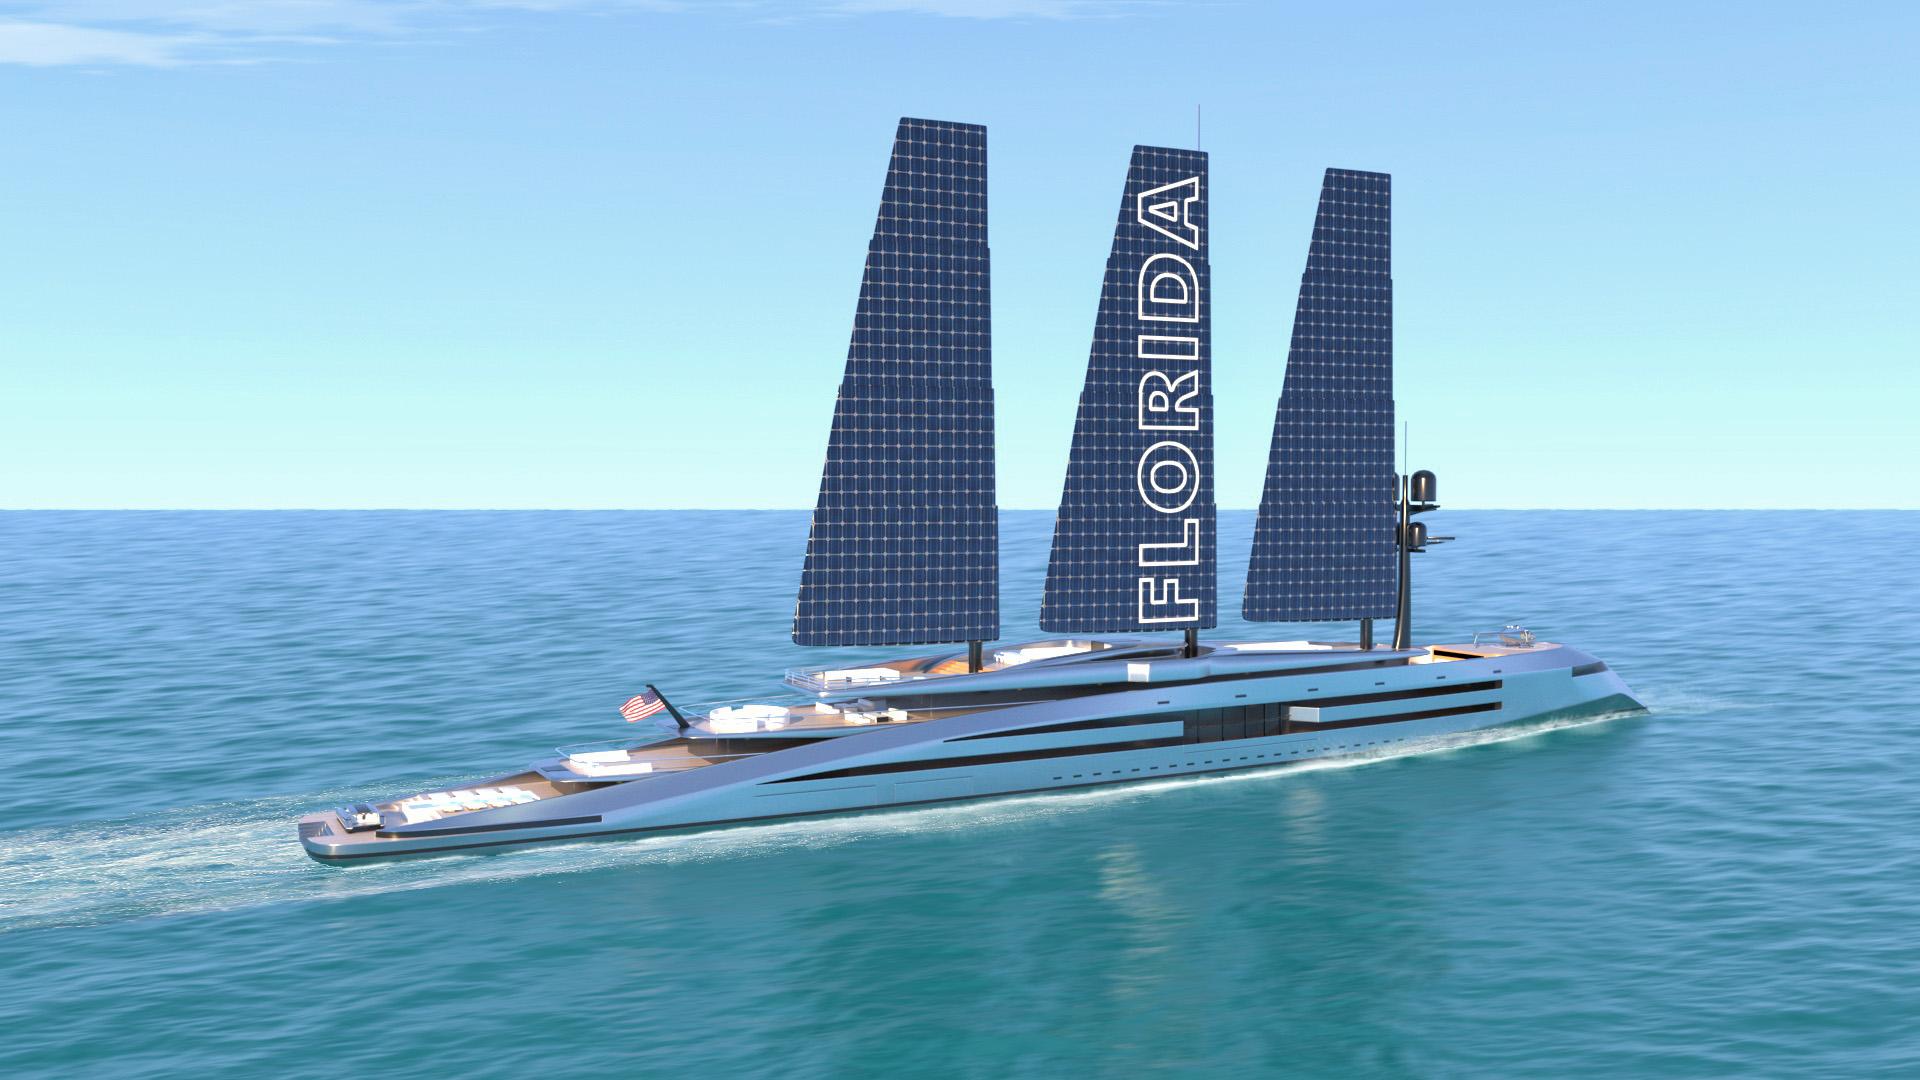 rende rof the Florida superyacht pictured cruising